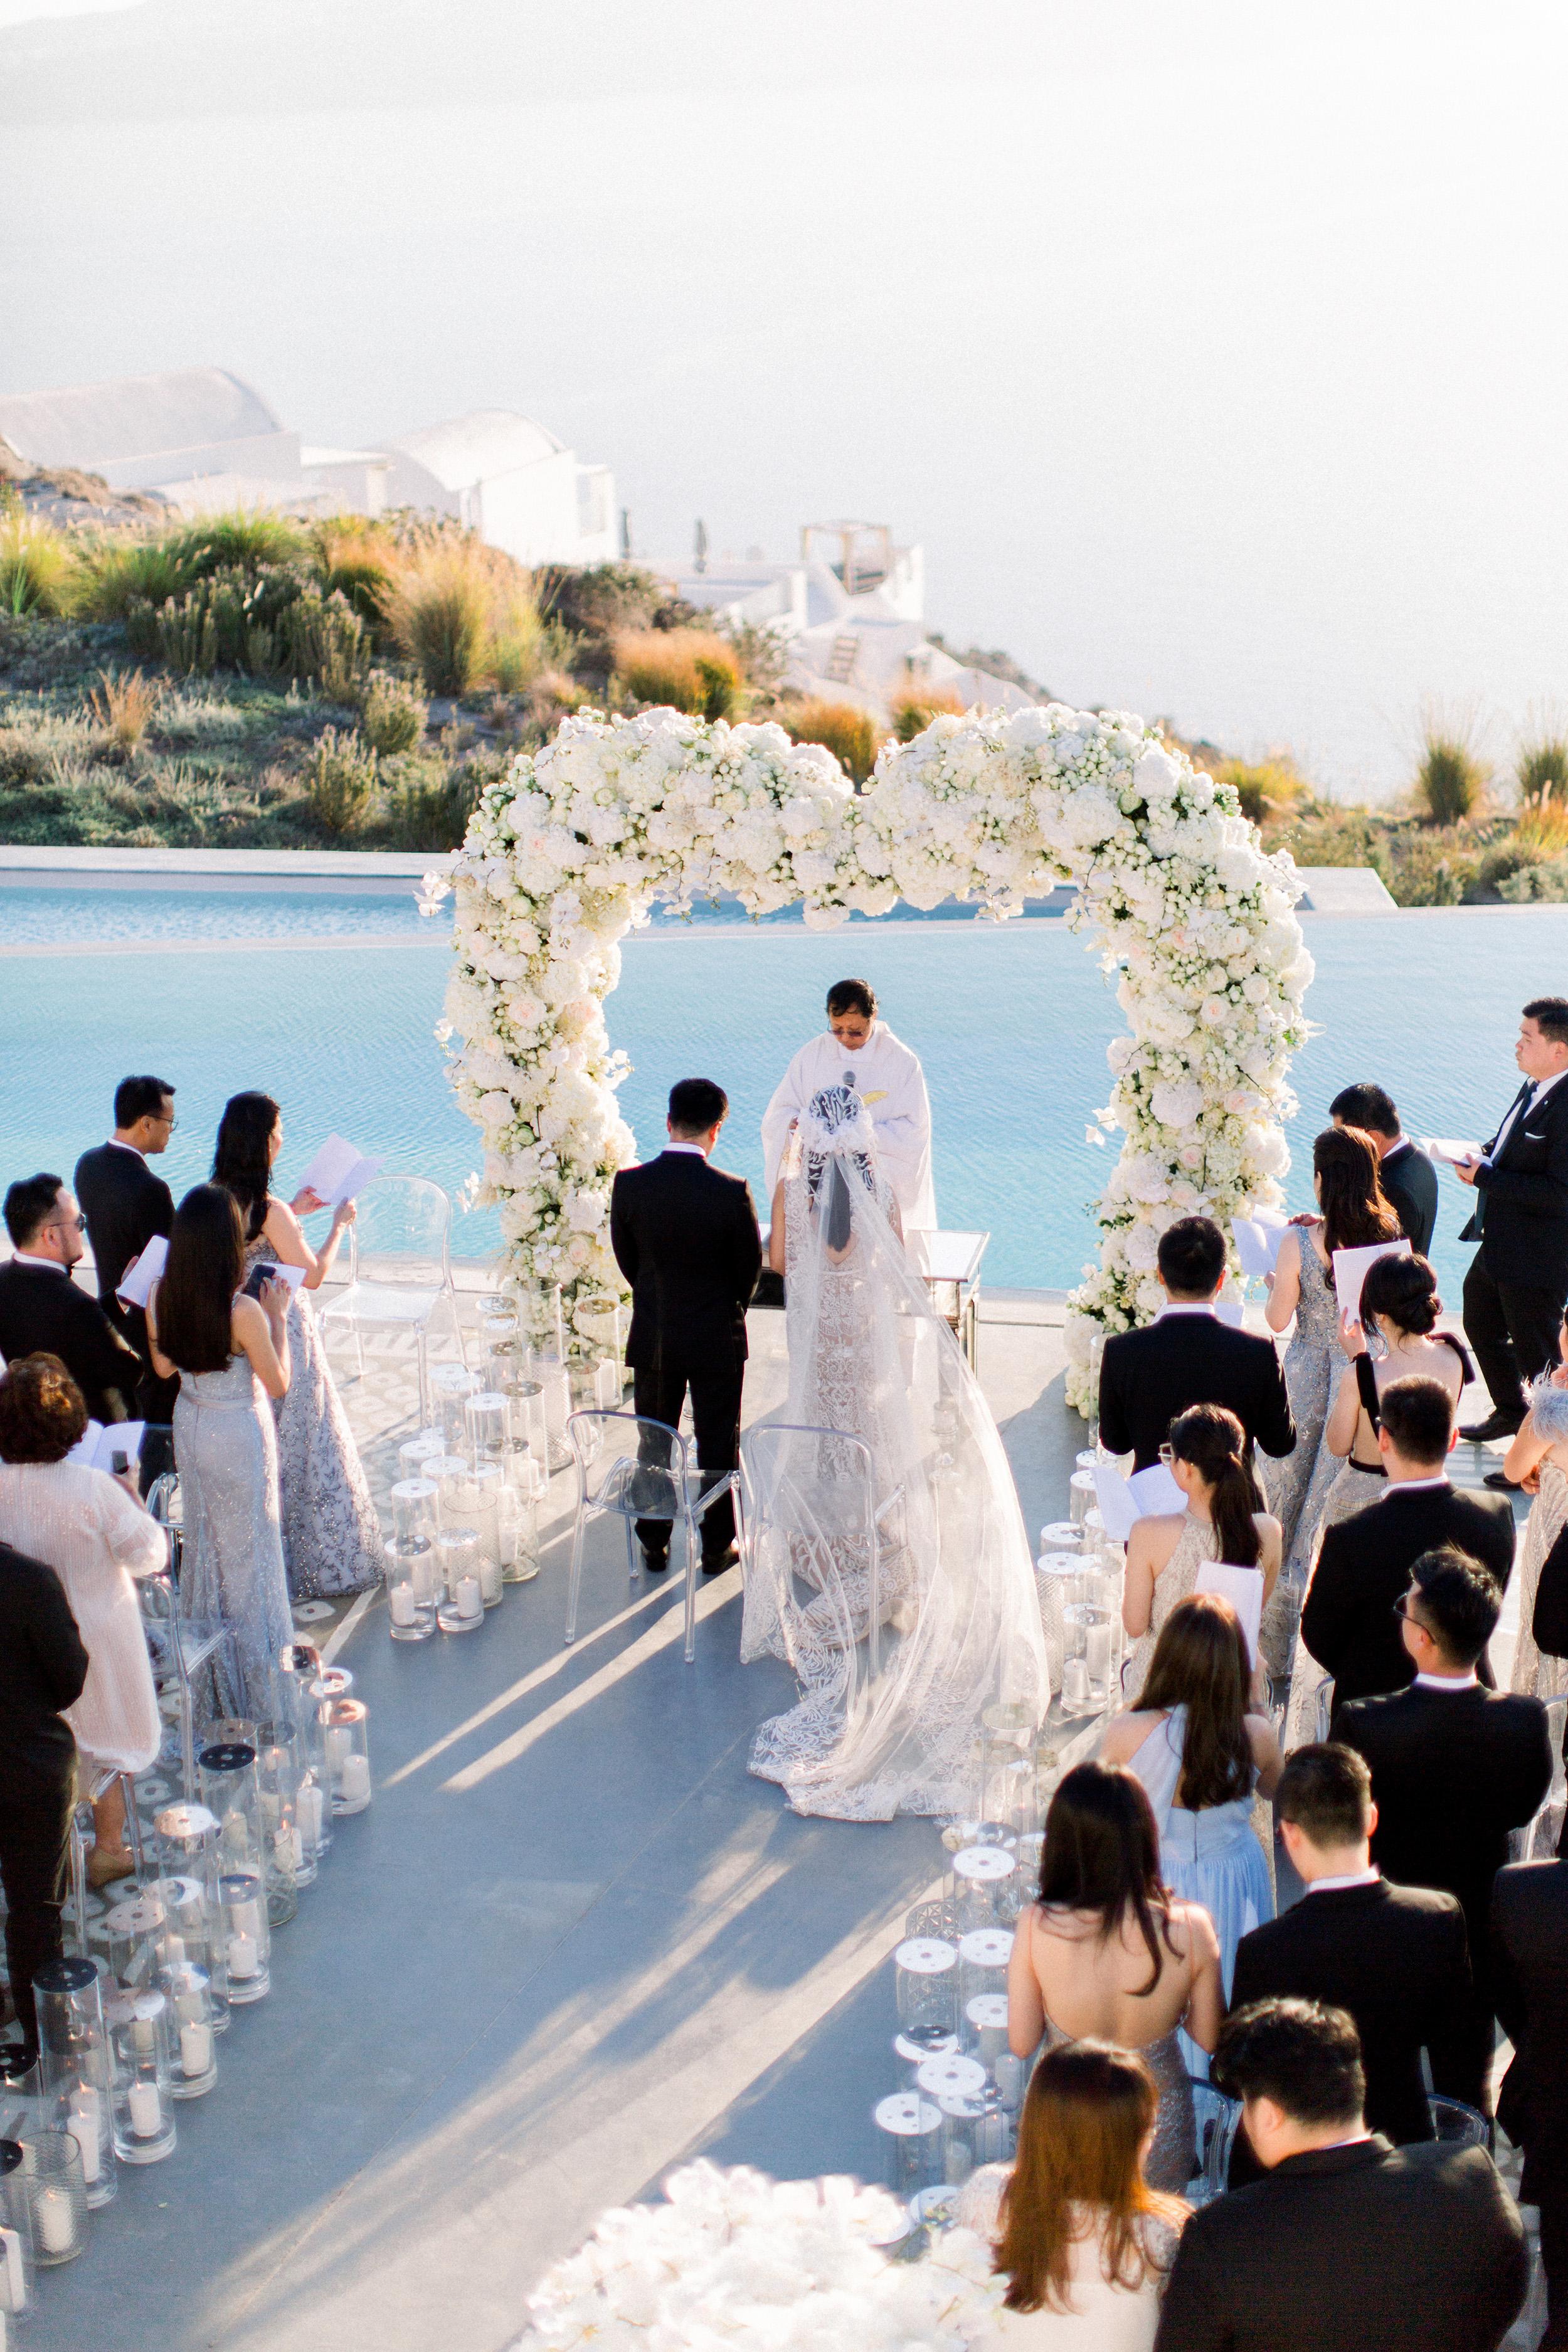 angie prayogo greece wedding outdoor ceremony couple flower arch